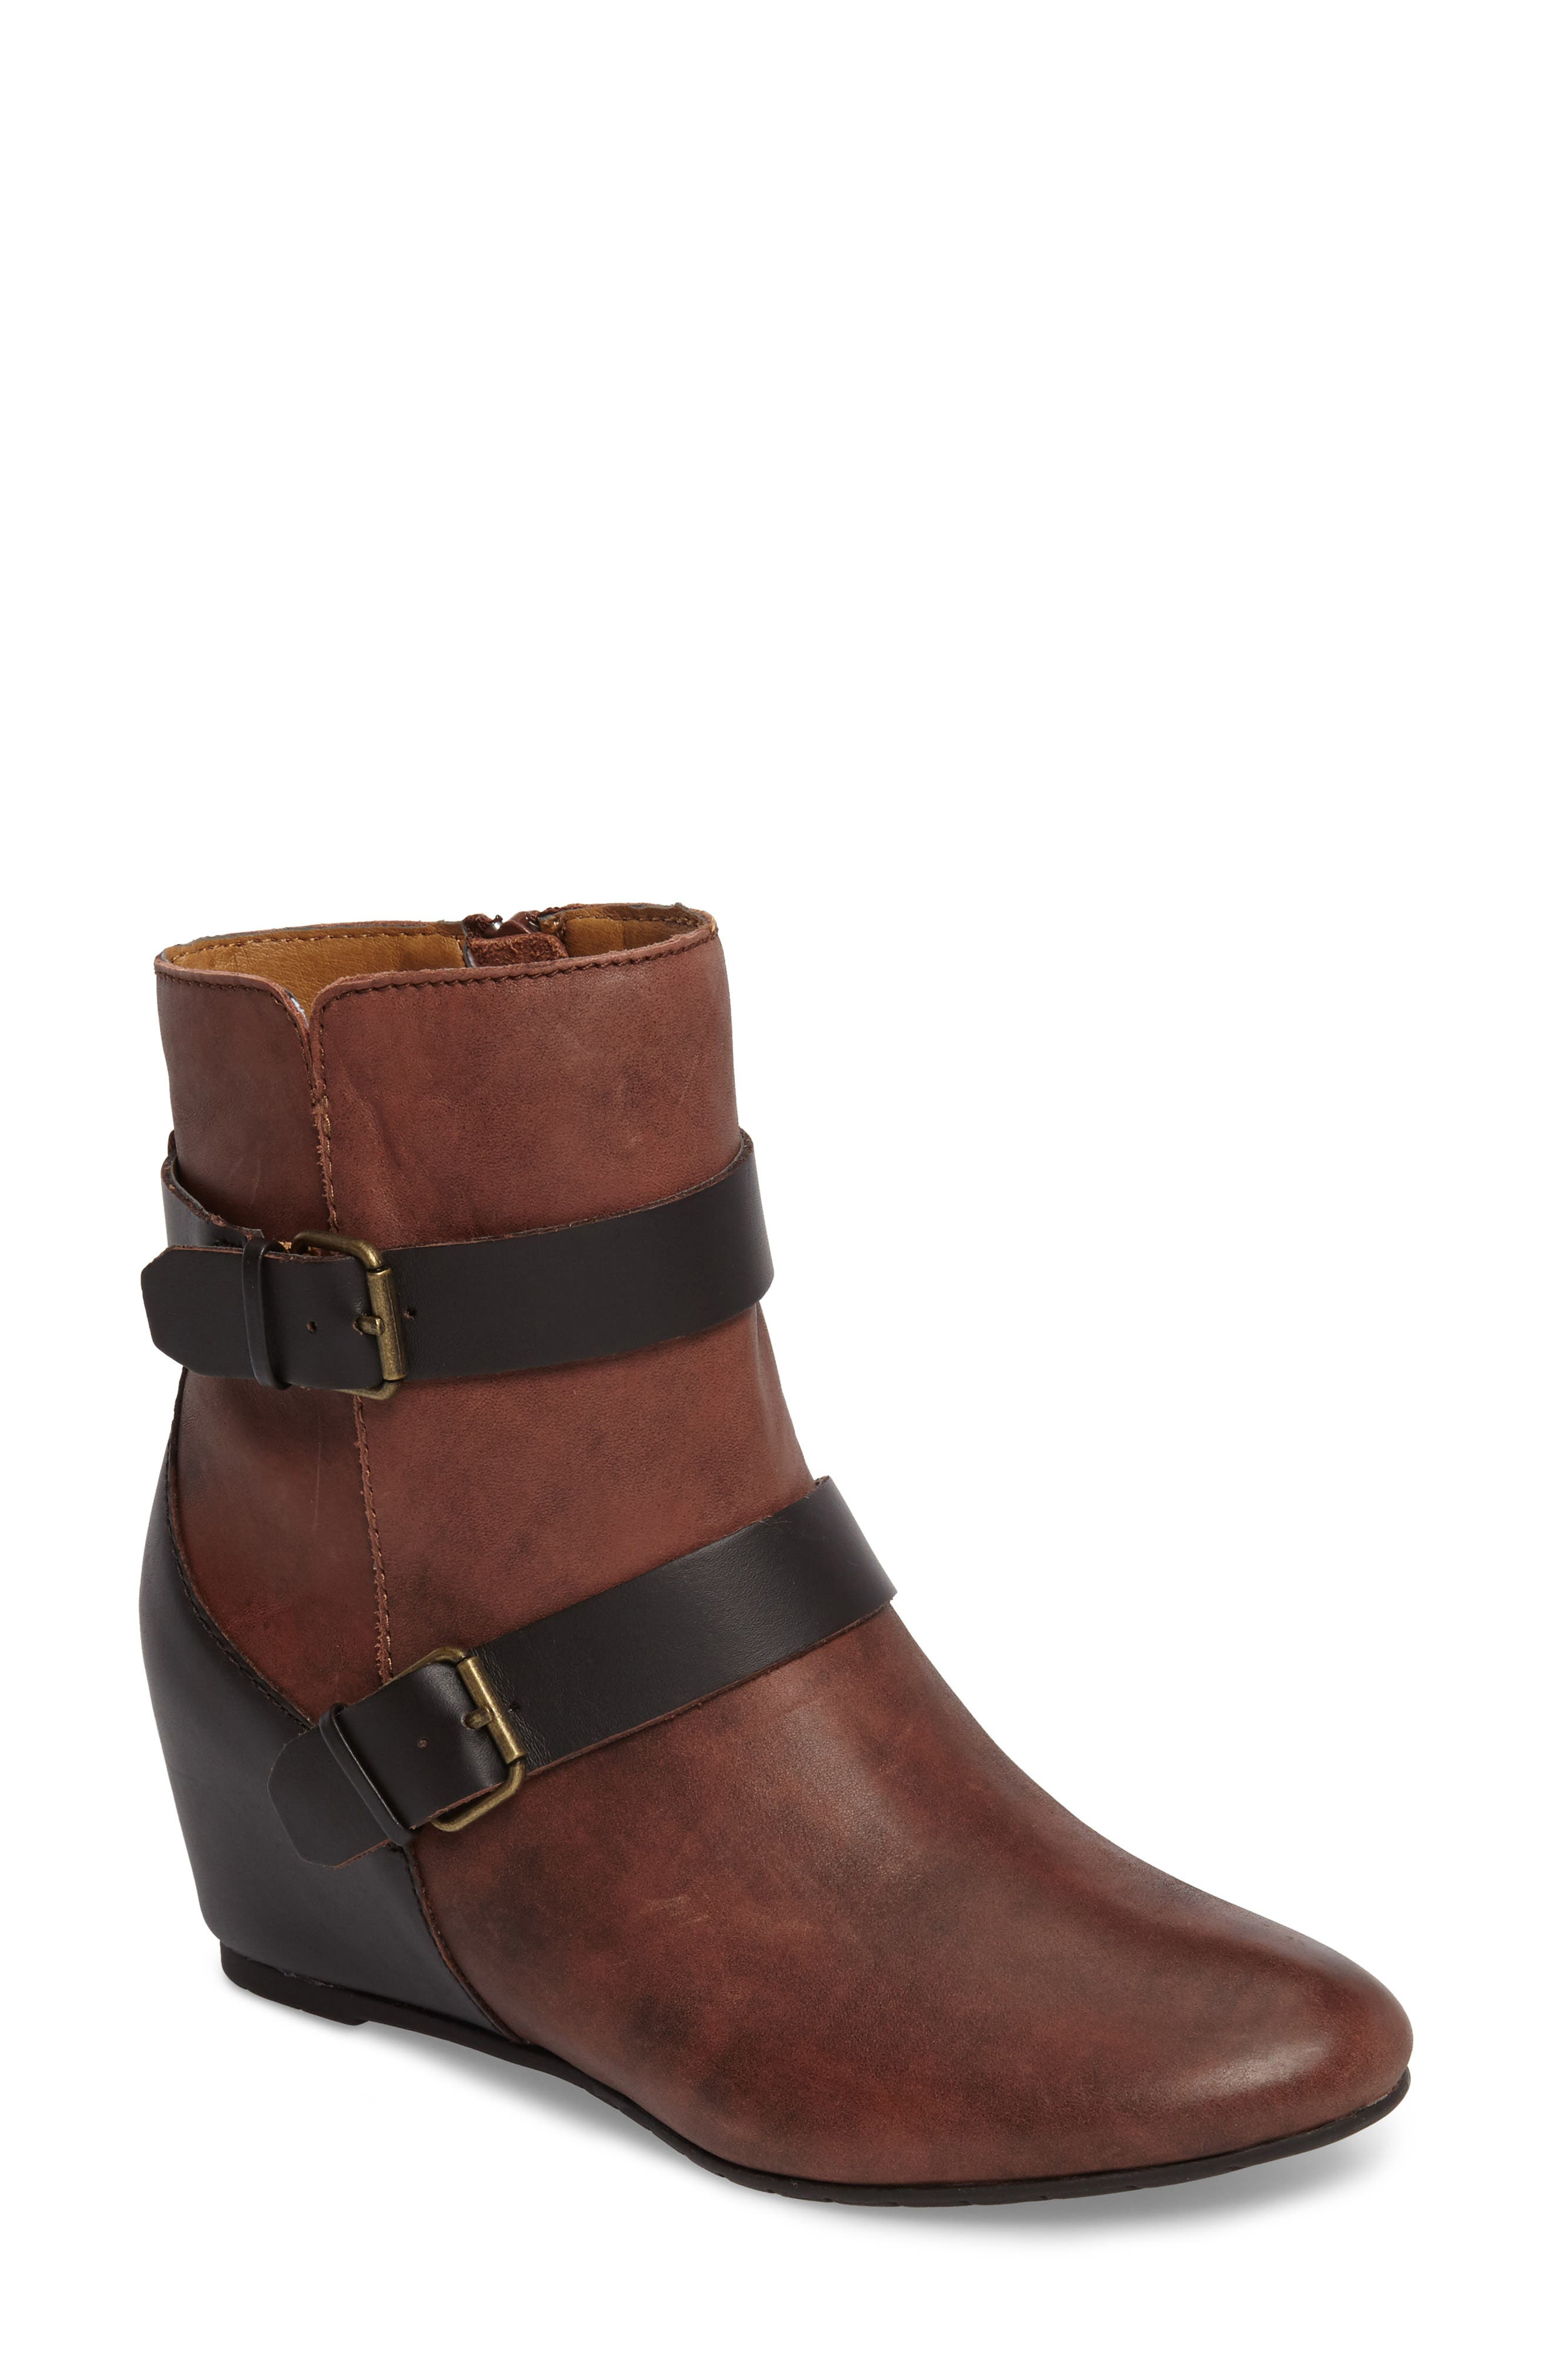 Ramika Wedge Bootie,                         Main,                         color, Mahogany Leather